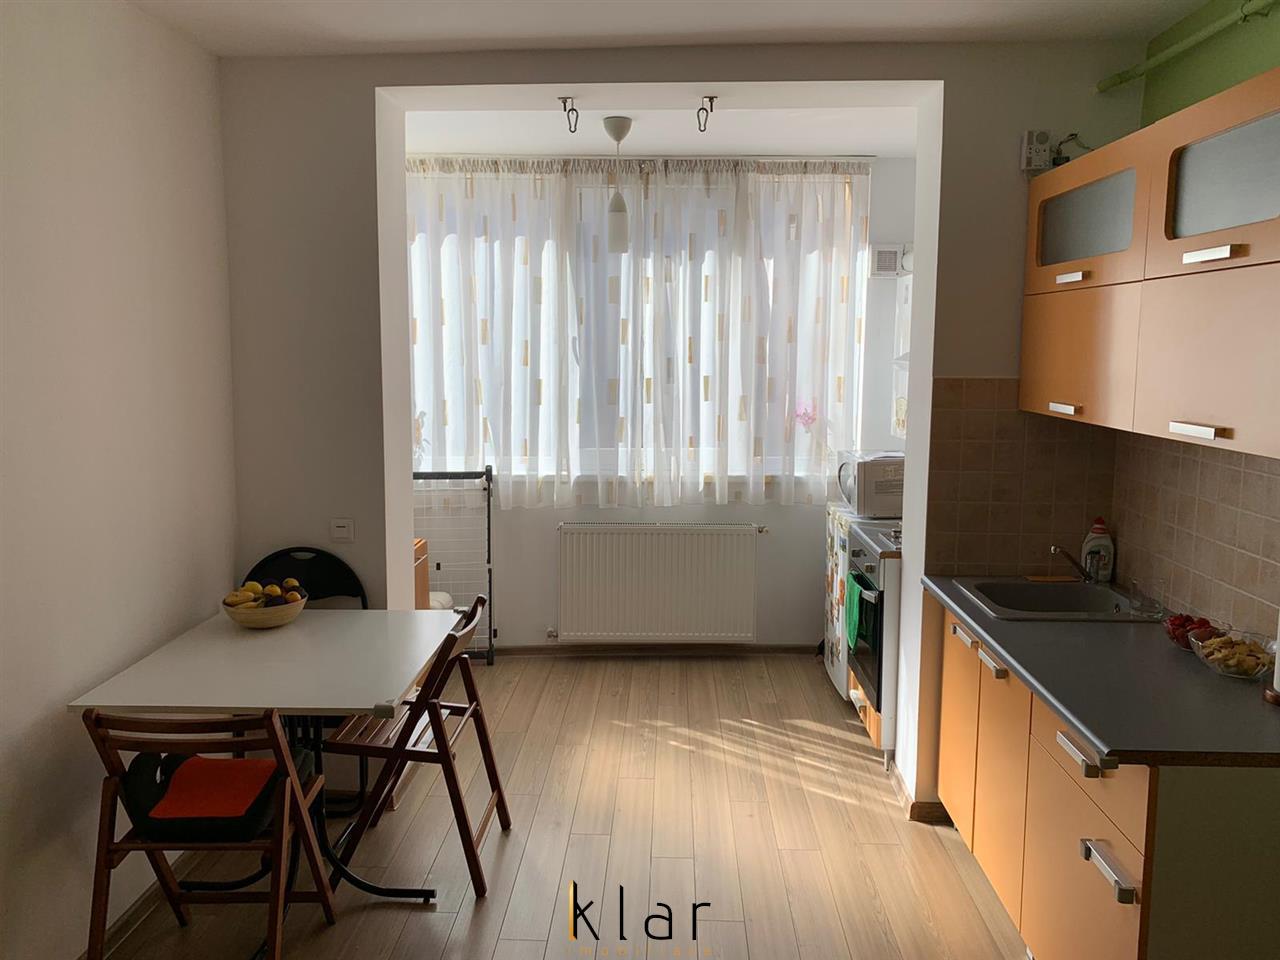 Apartament 2 camere, mobilat si utilat, loc de parcare, zona Florilor